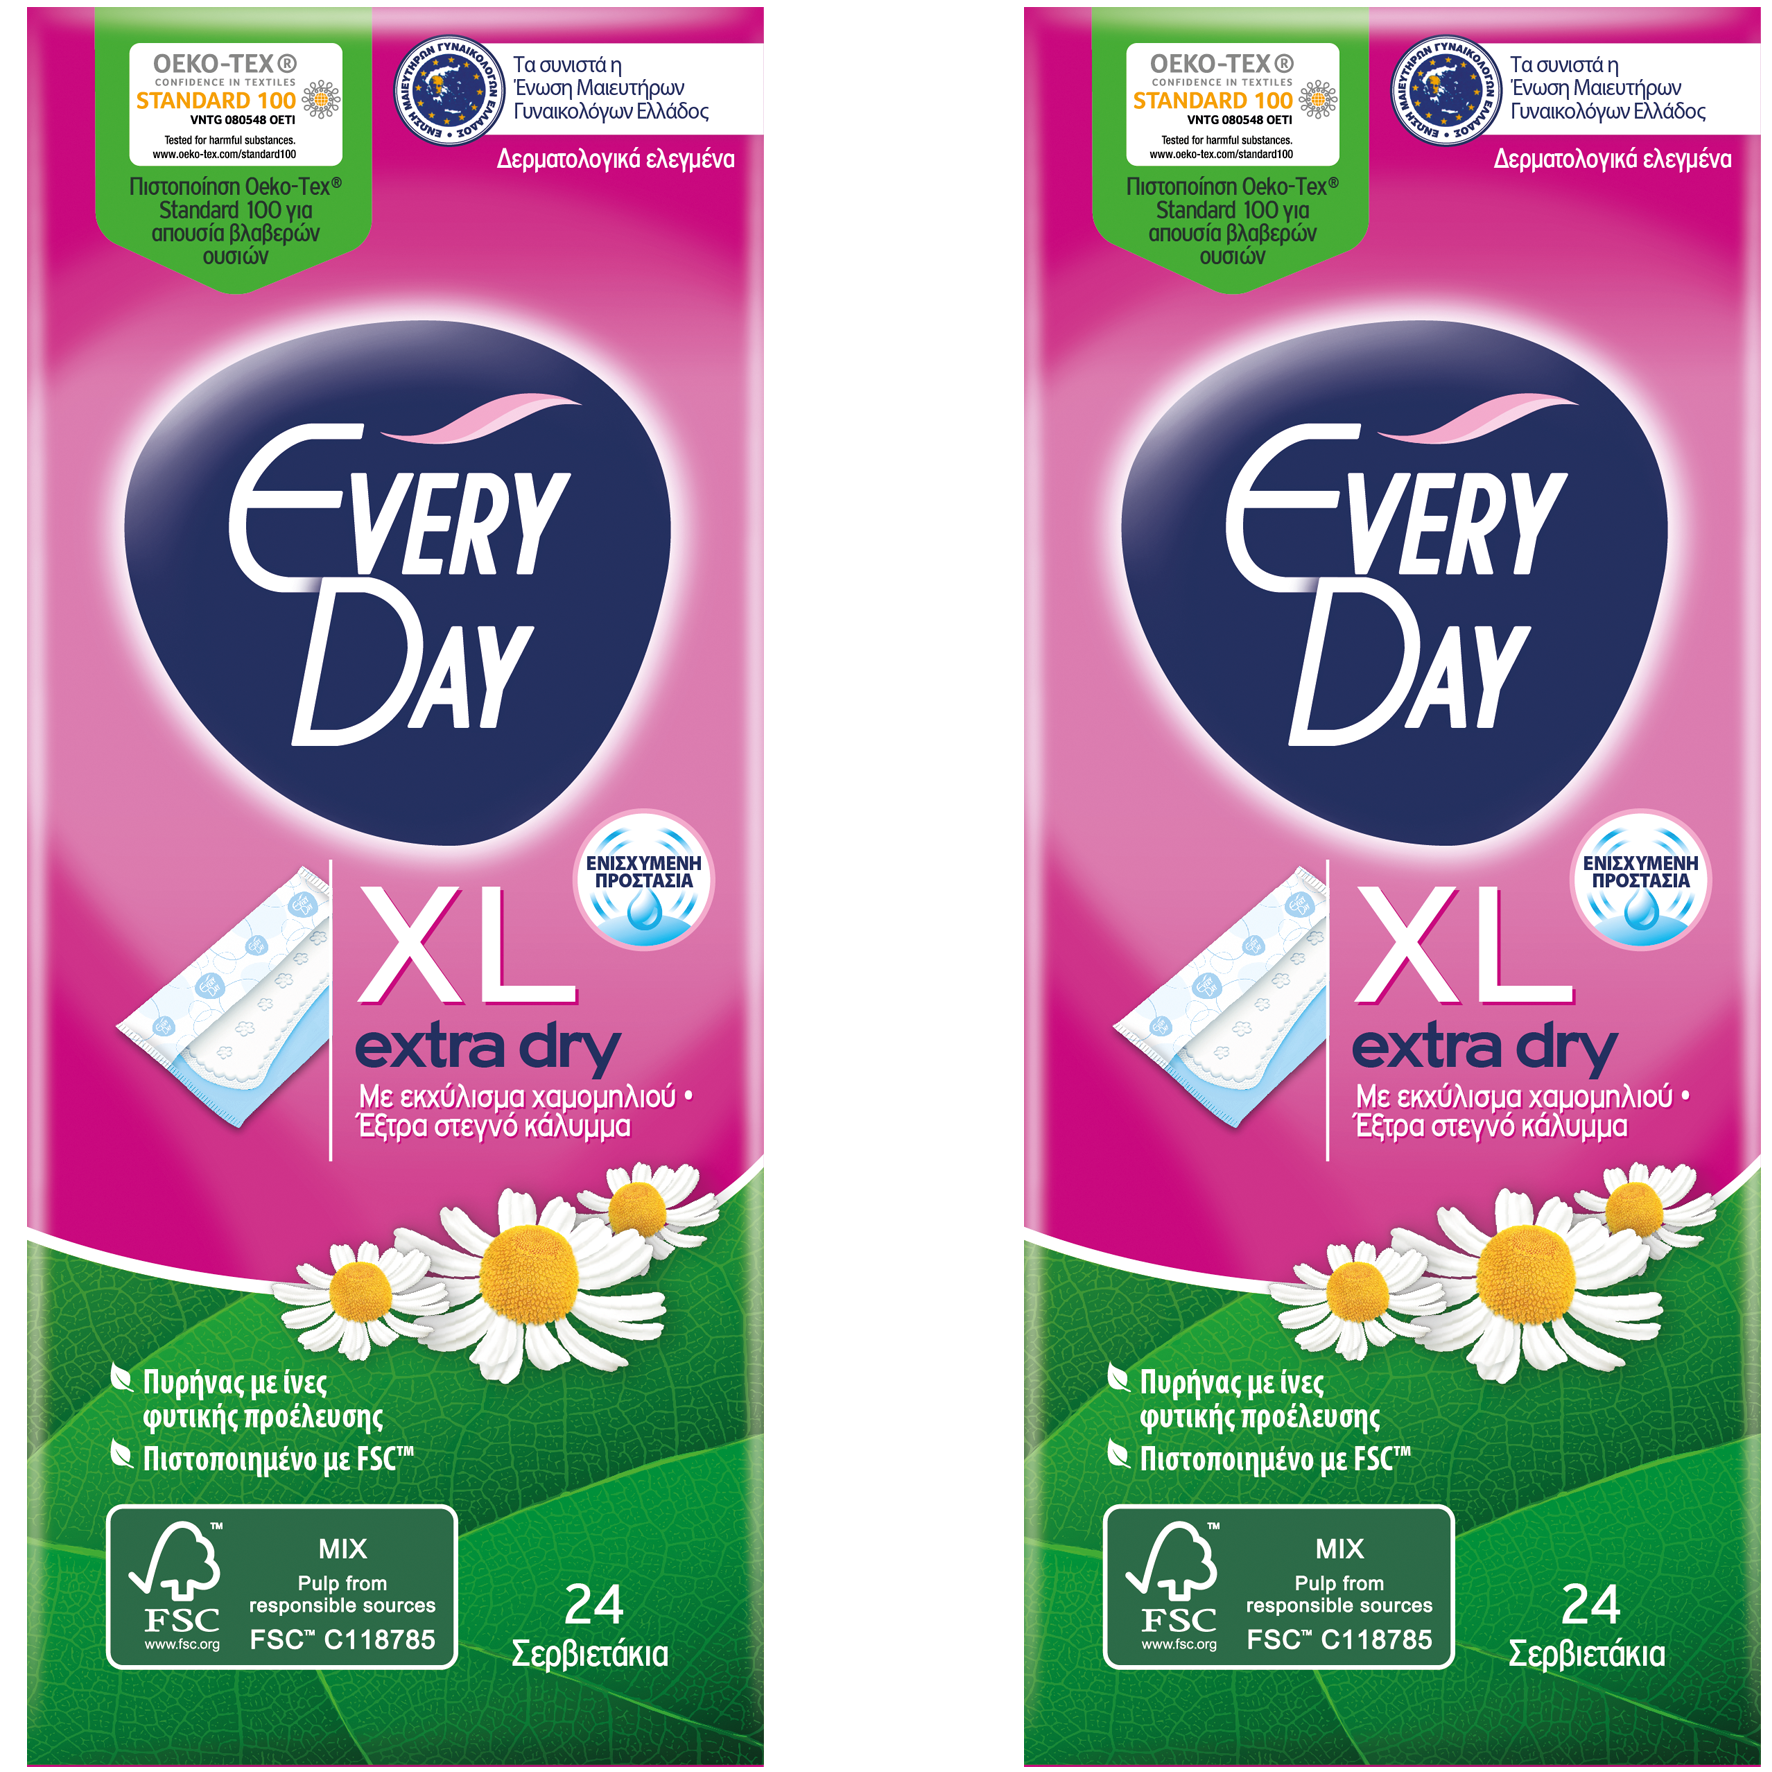 Every Day Πακέτο Προσφοράς Extra Dry XL Ανατομικά Σερβιετάκια για Πολύ Μεγάλη Ροή 2×24 Τεμάχια 1+1 Δώρο